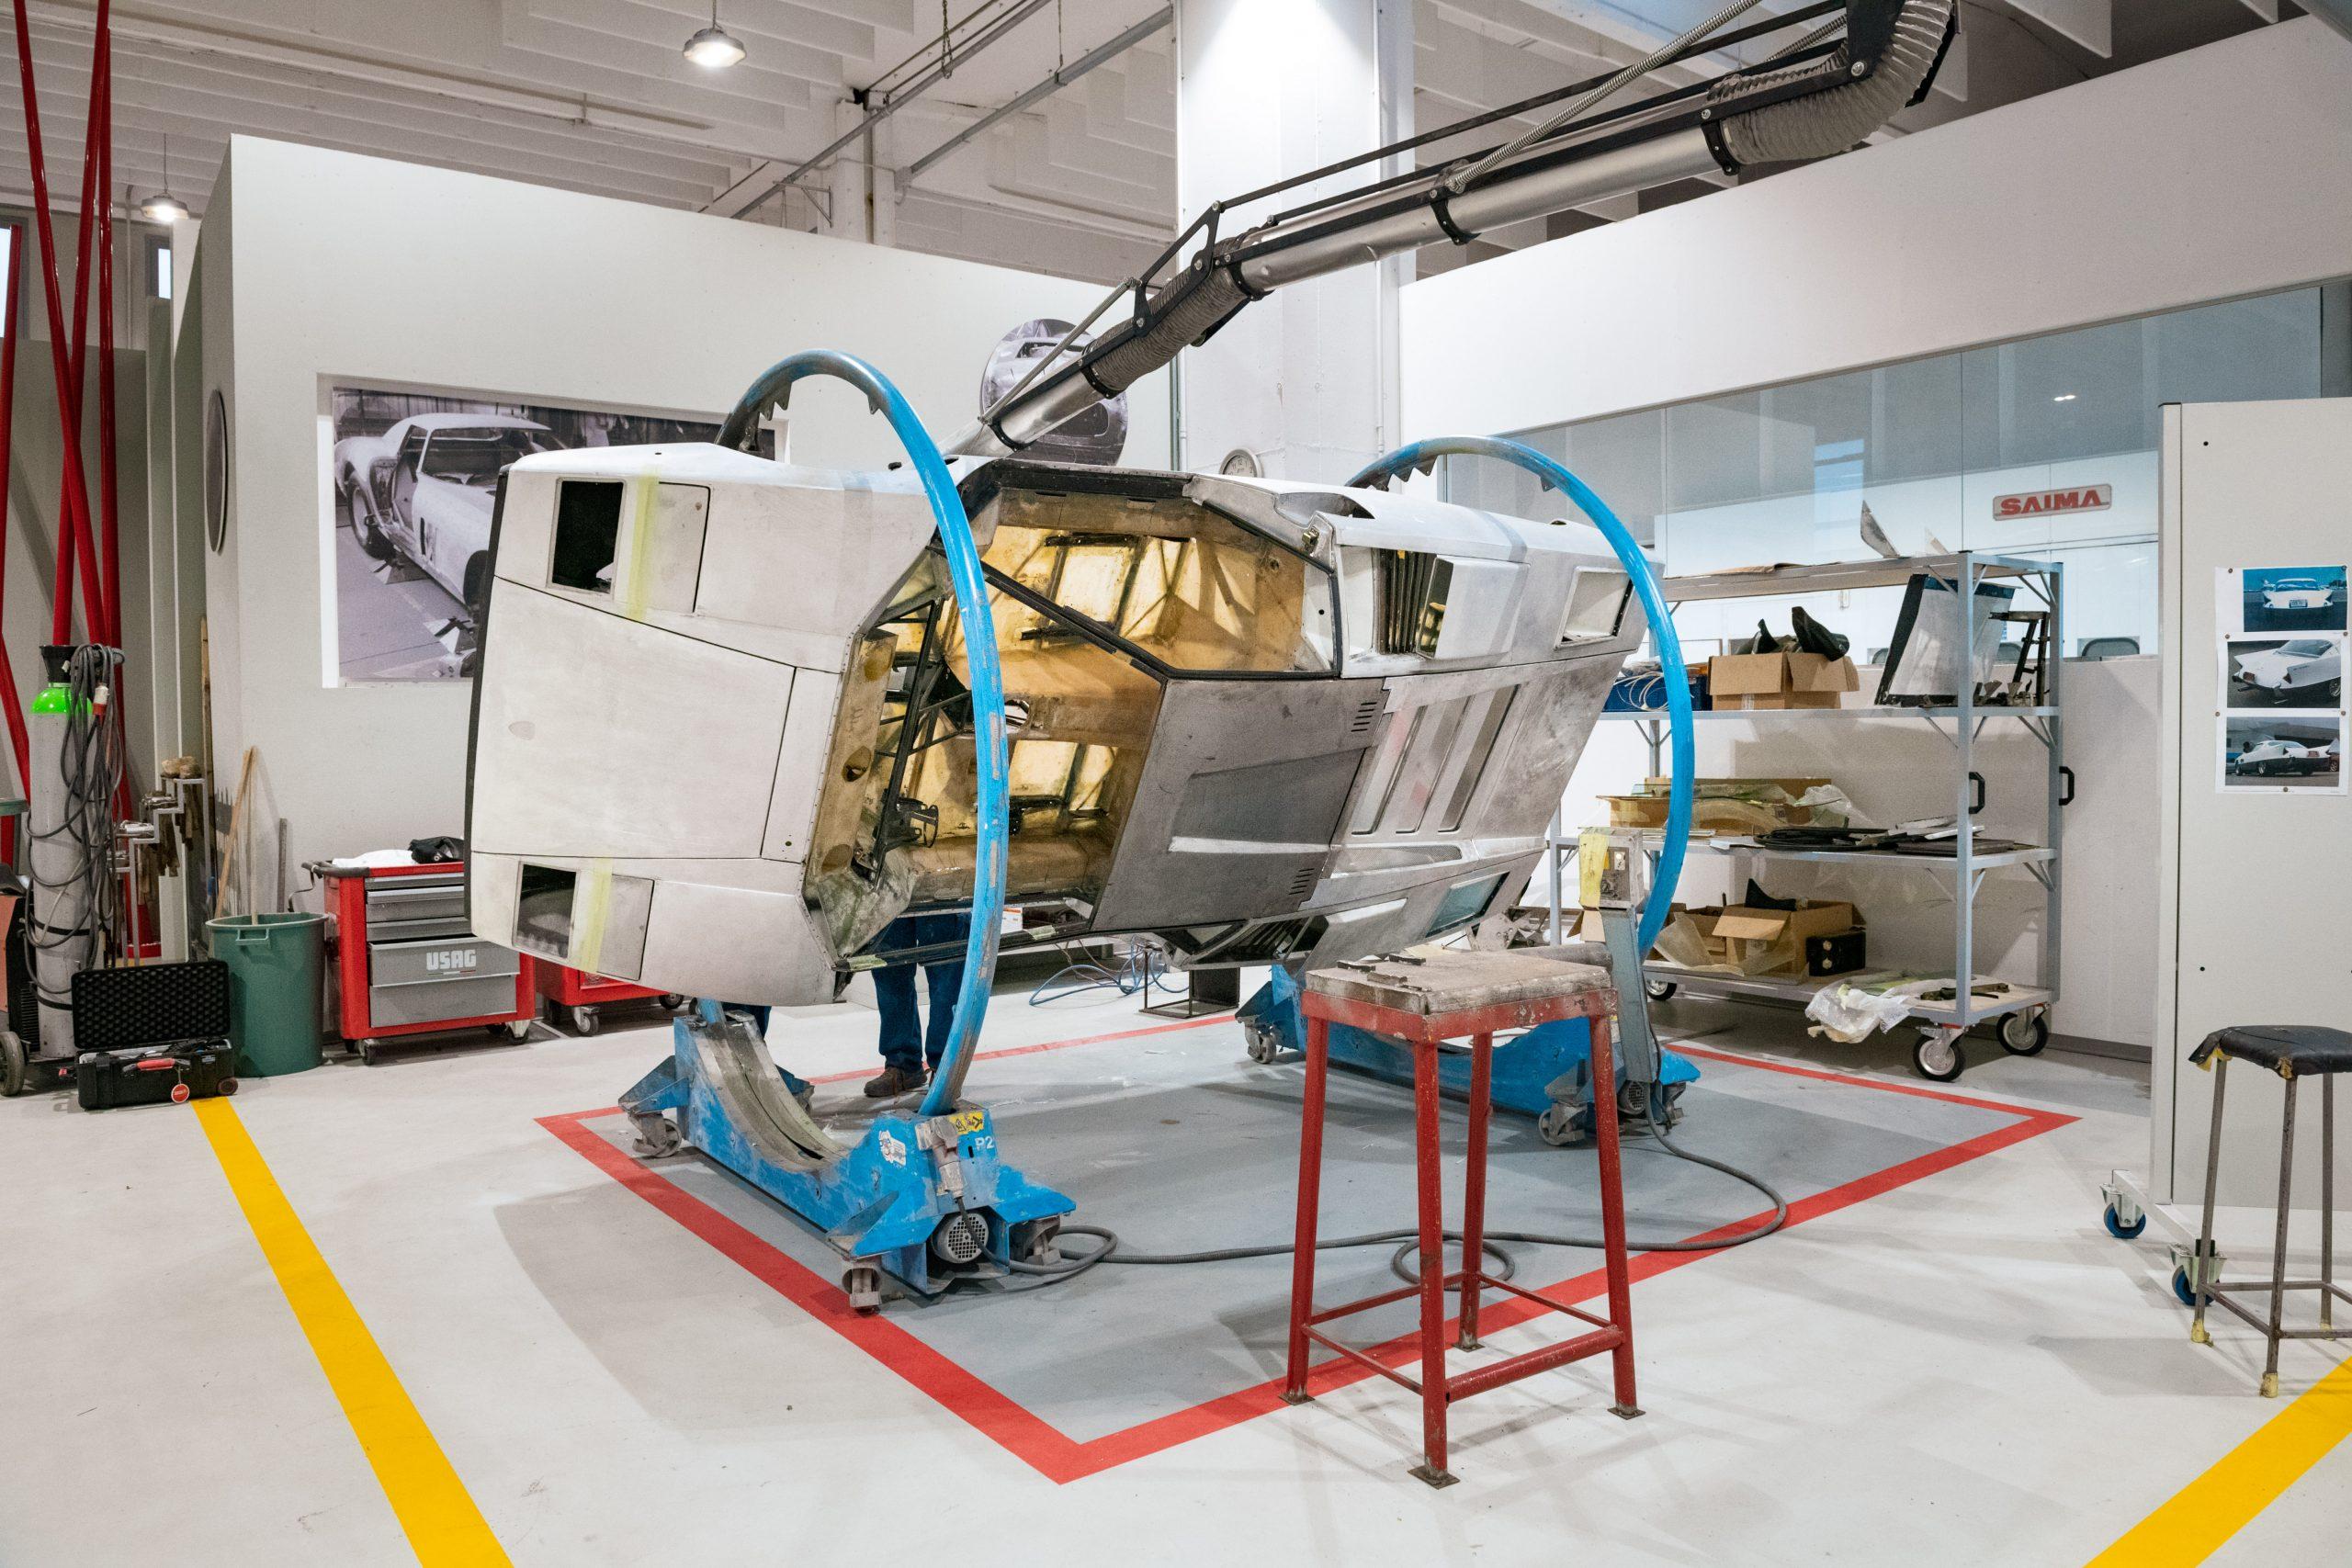 lamborghini countach restoration body sideways in rotisserie machine